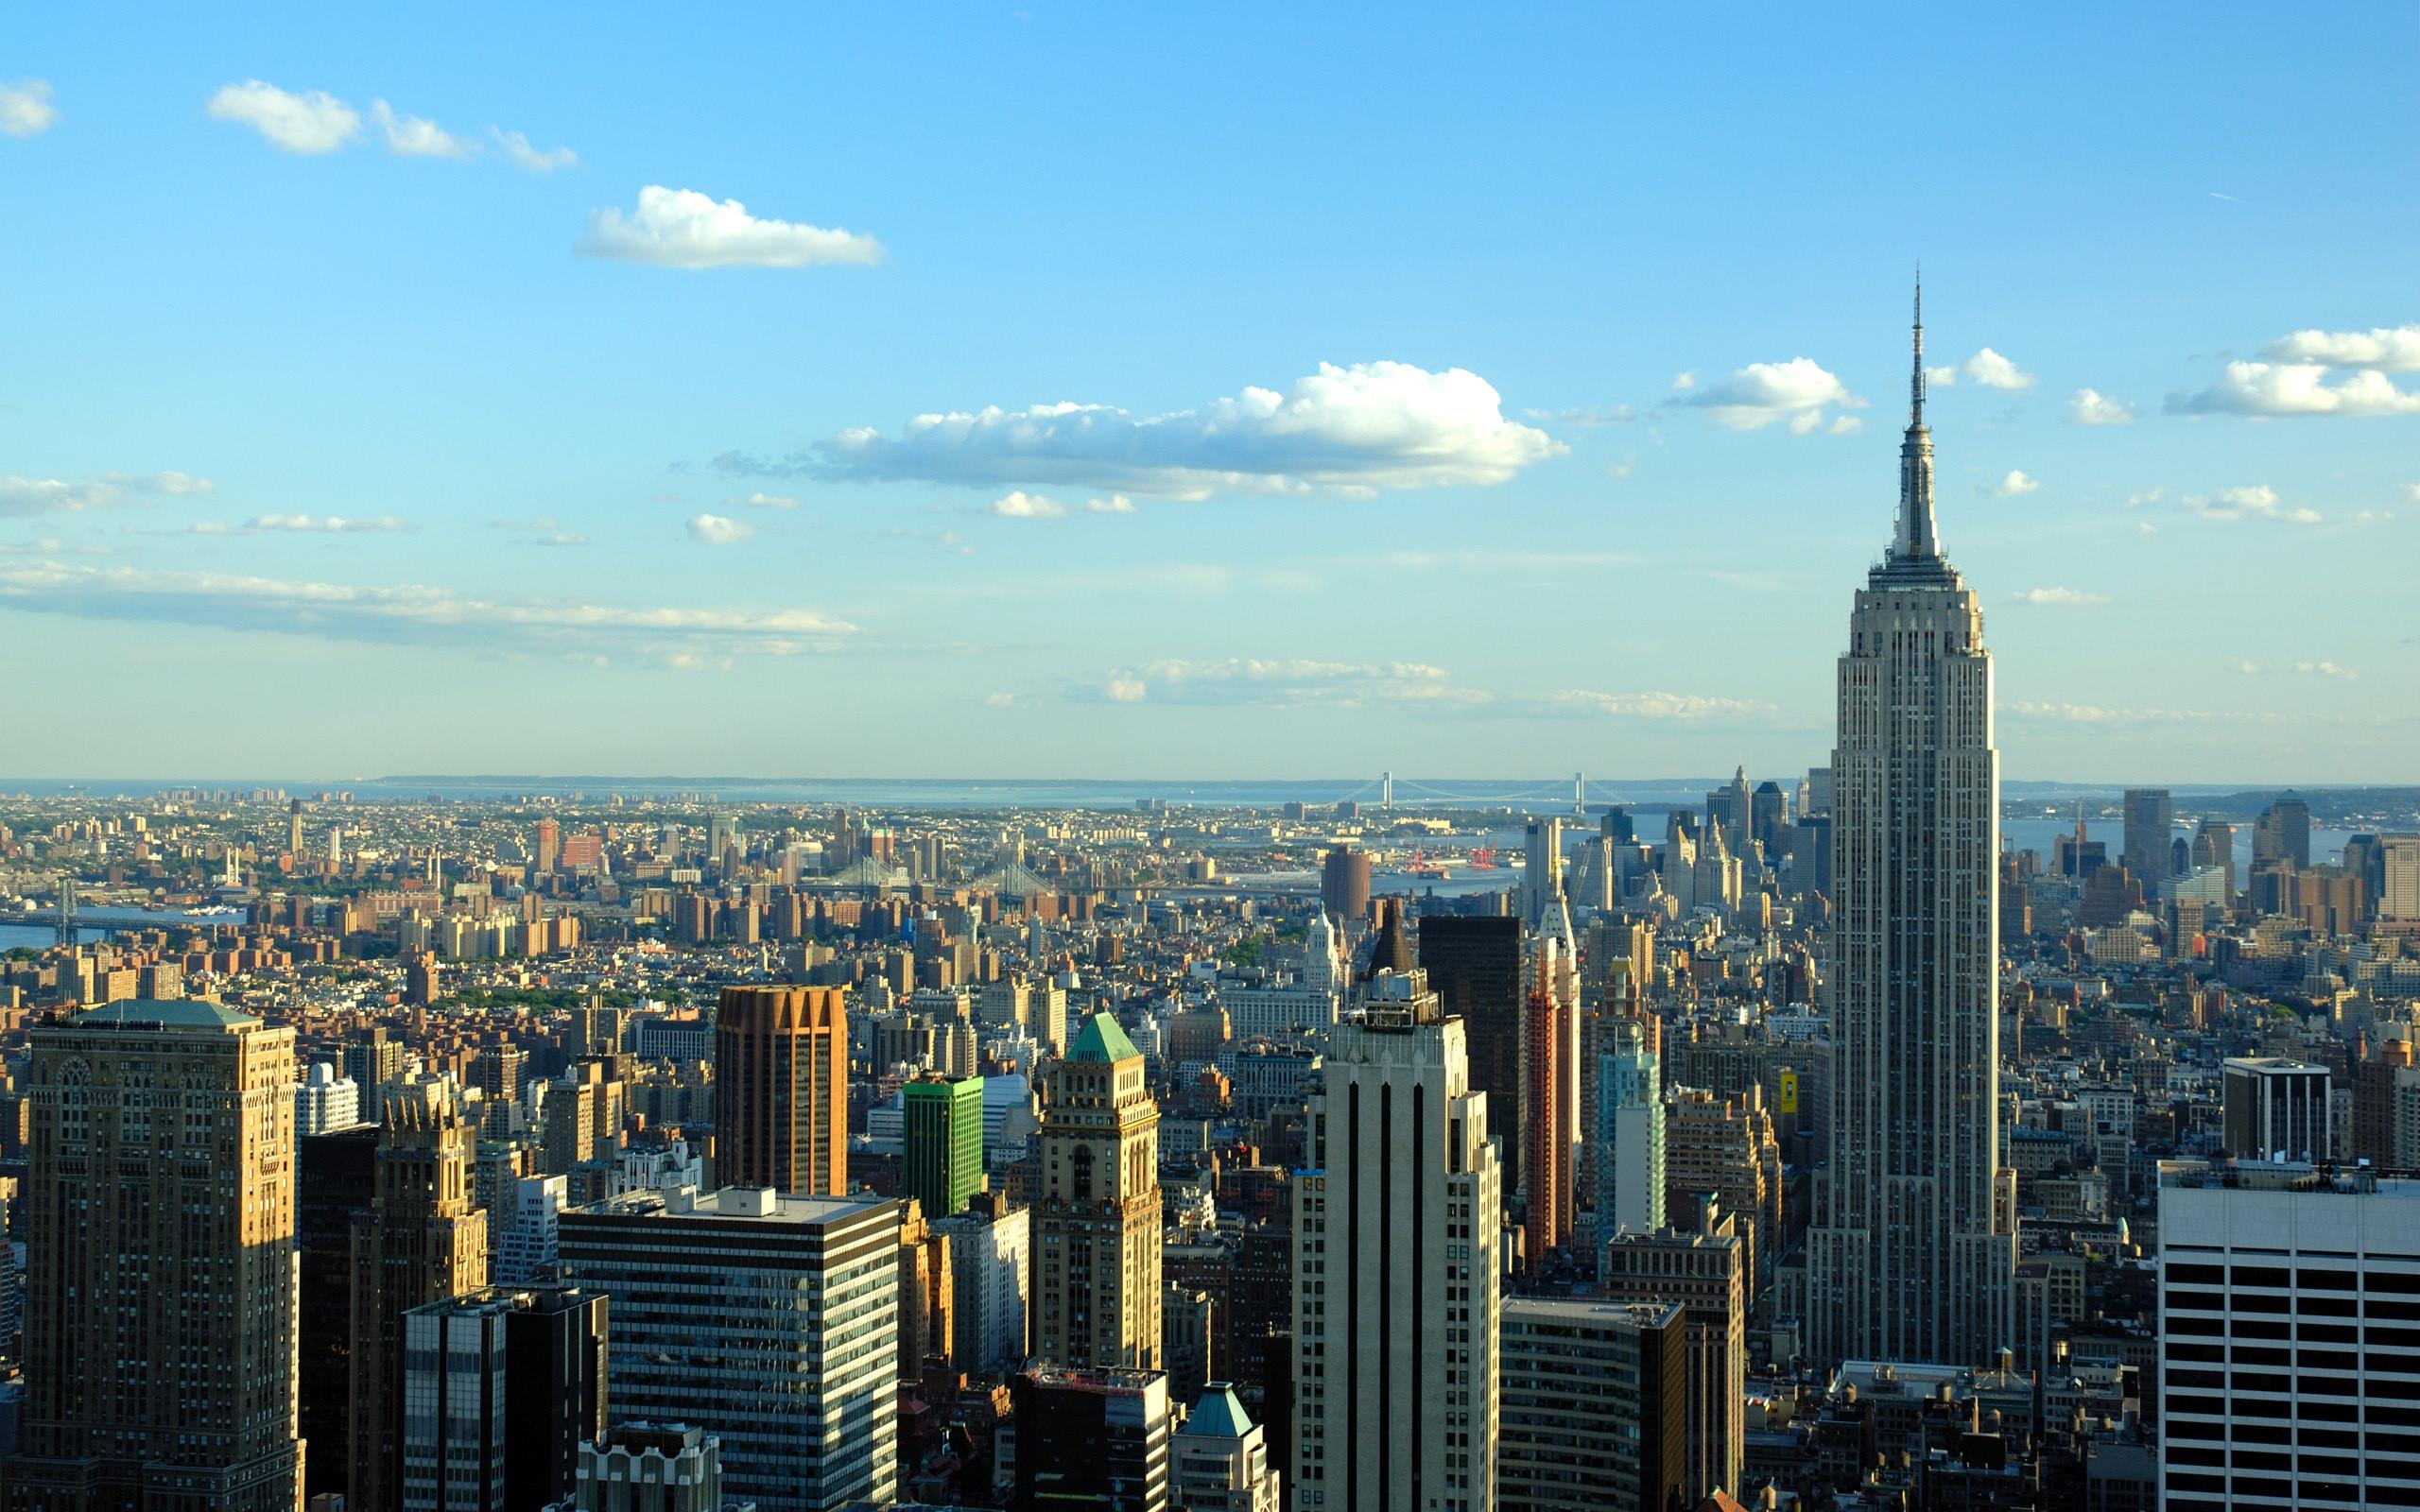 New York City Skyline Desktop Background #7776 | Frenzia.com